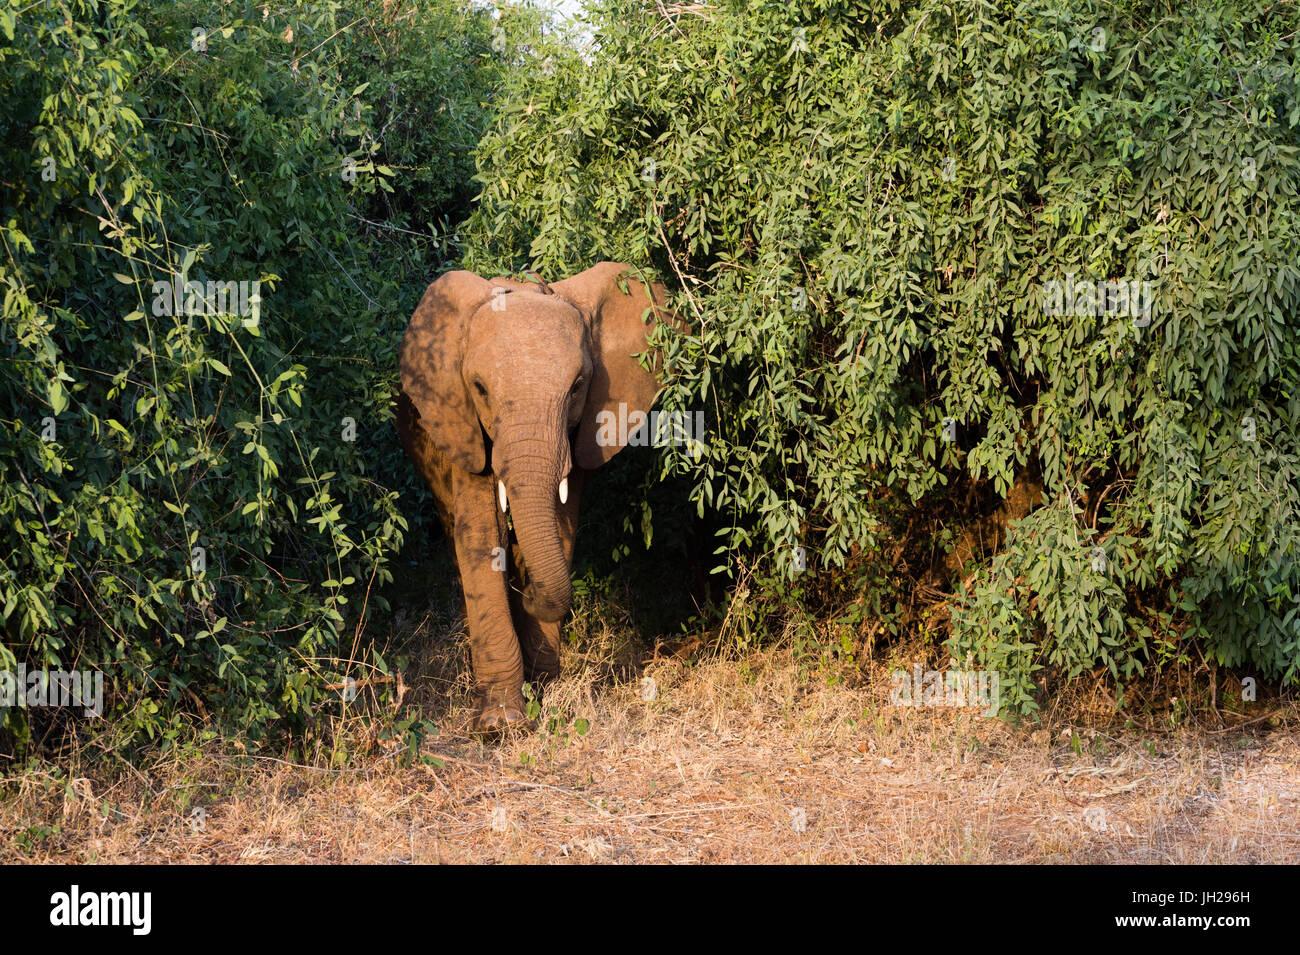 An African elephant (Loxodonta Africana), emerges from the bush, Samburu, Kenya, East Africa, Africa - Stock Image